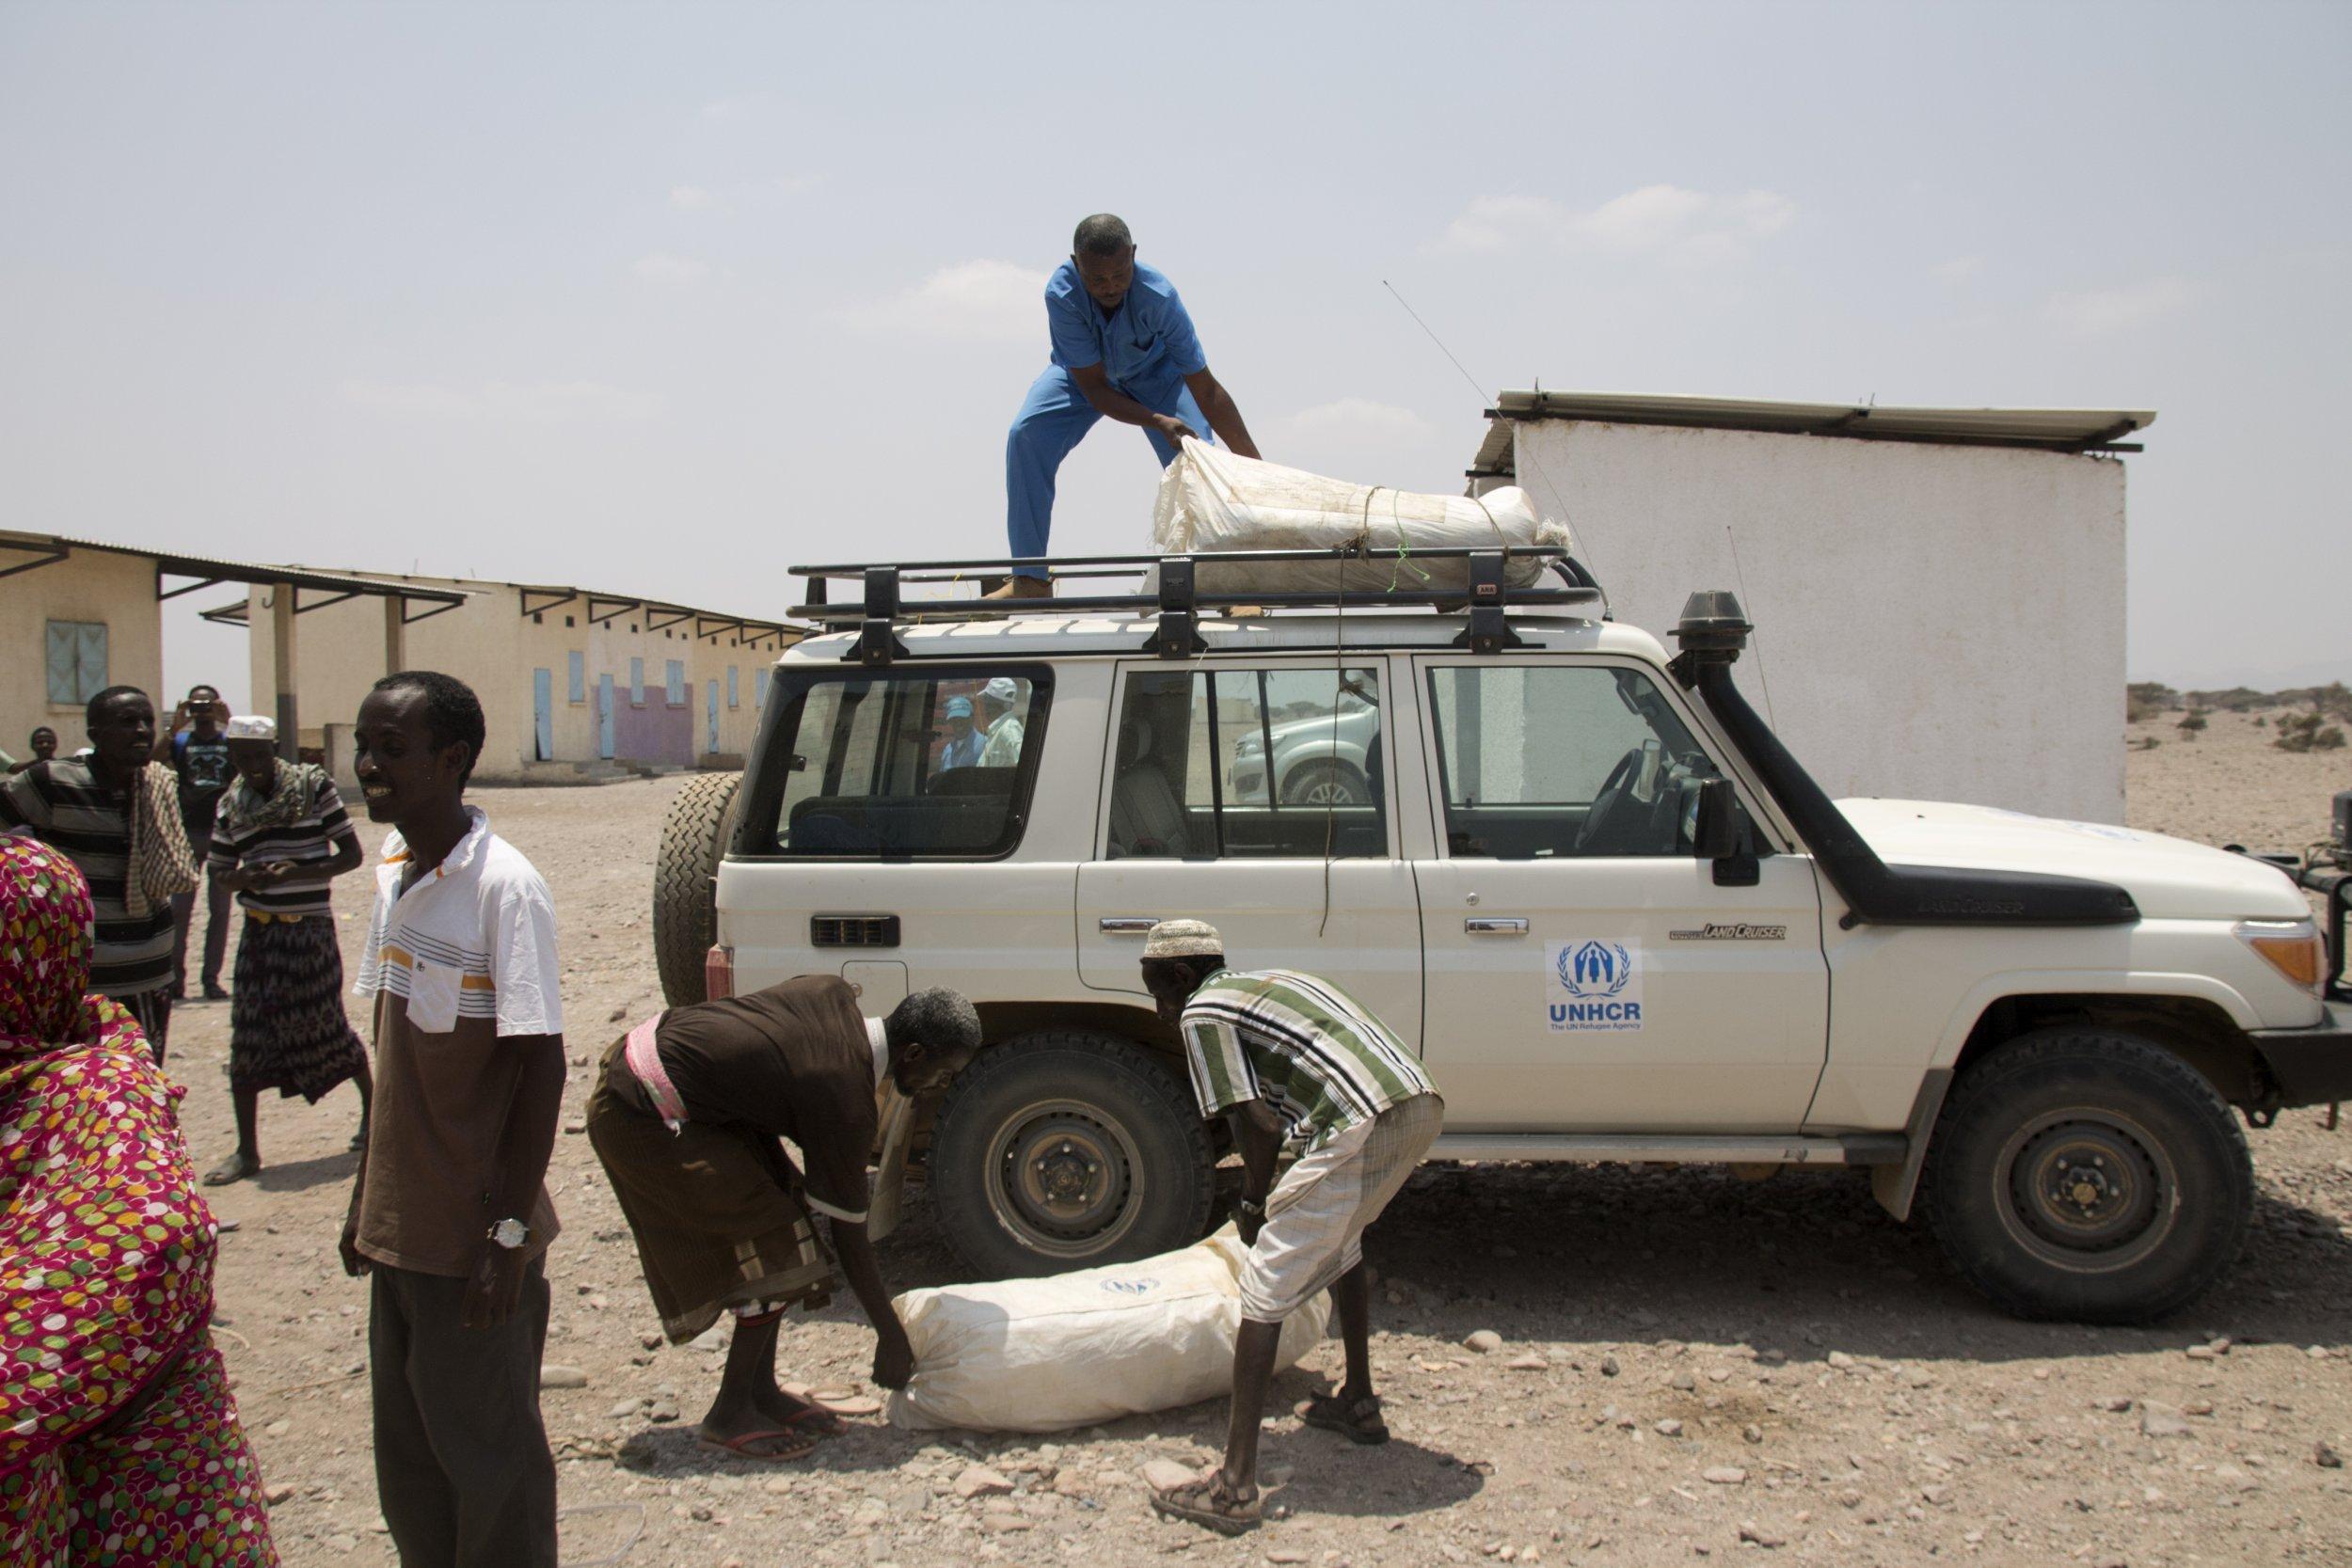 Preparation, Refugee Camp, Oulma, Djibouti